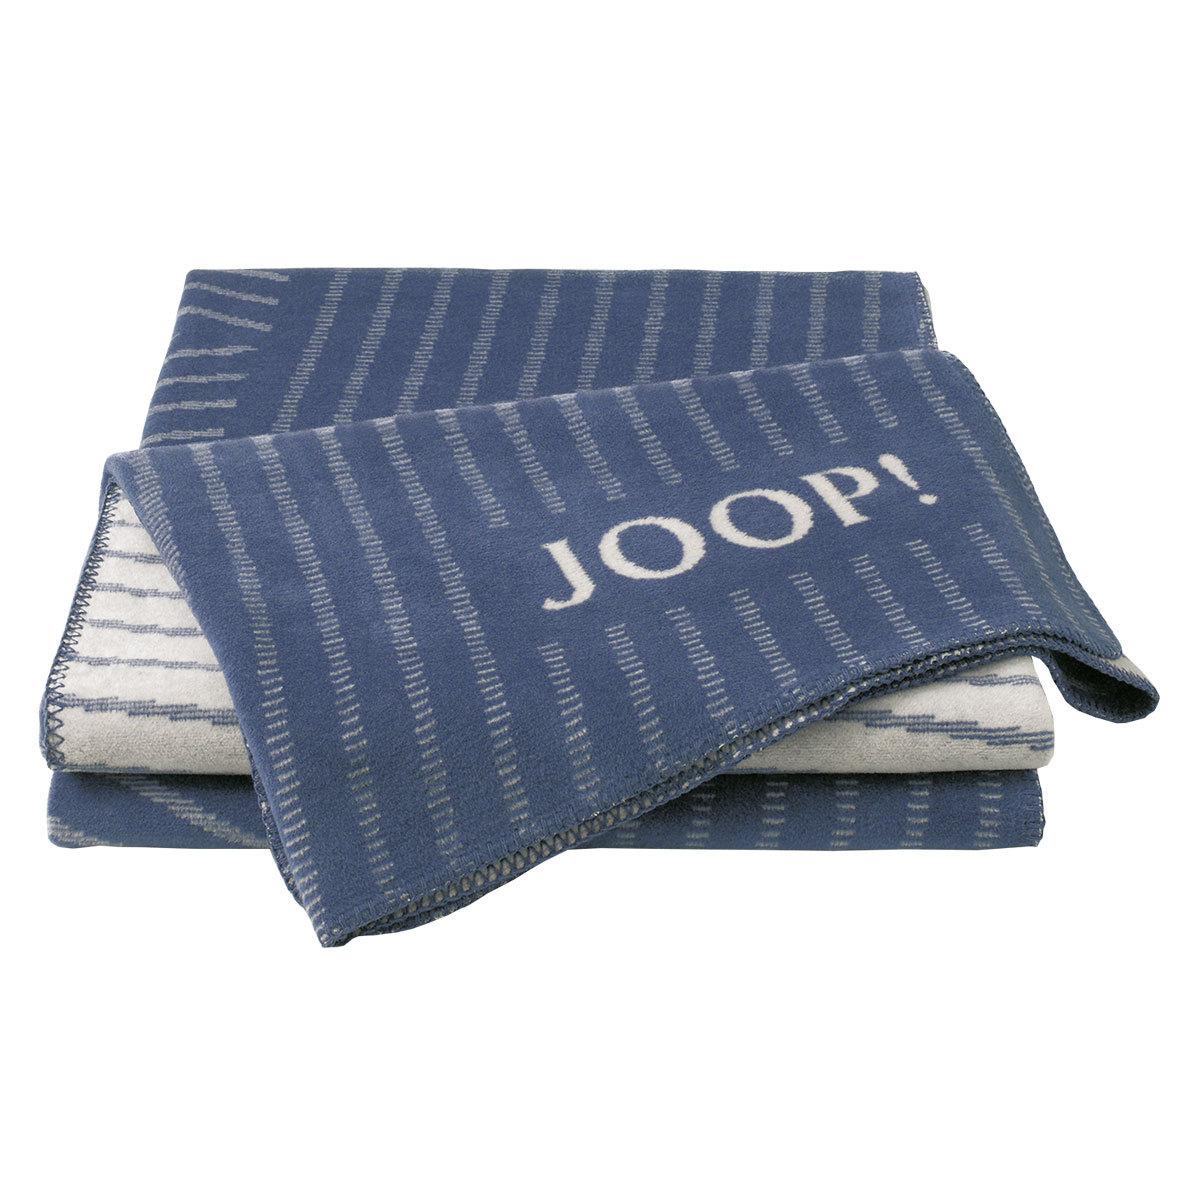 JOOP Wohndecke Cross Stripes Jeans-Rauch